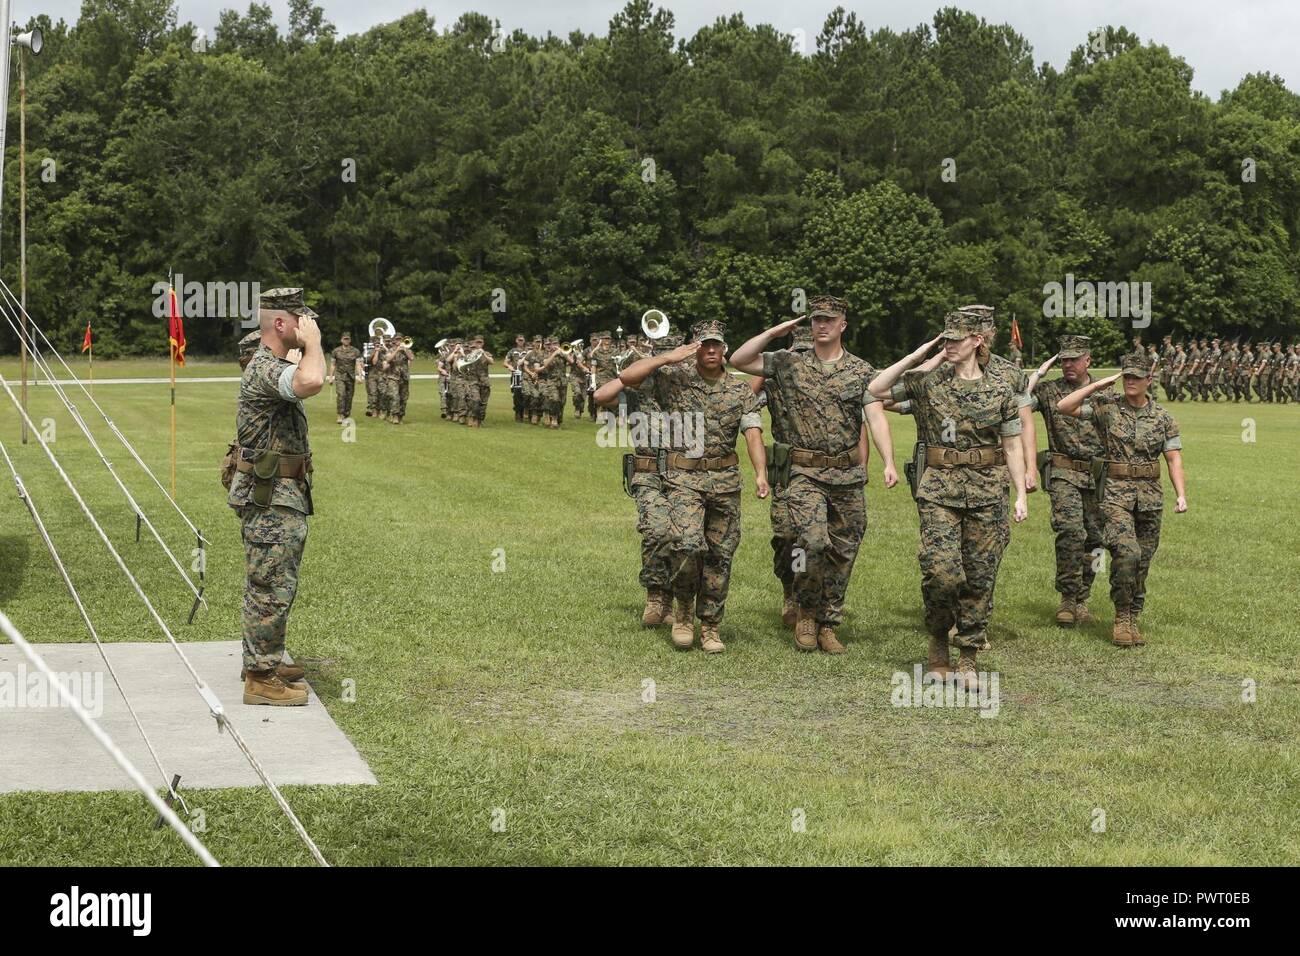 Us Marine Corps Lt Col Lauren S Edwards And Lt Col Patrick G